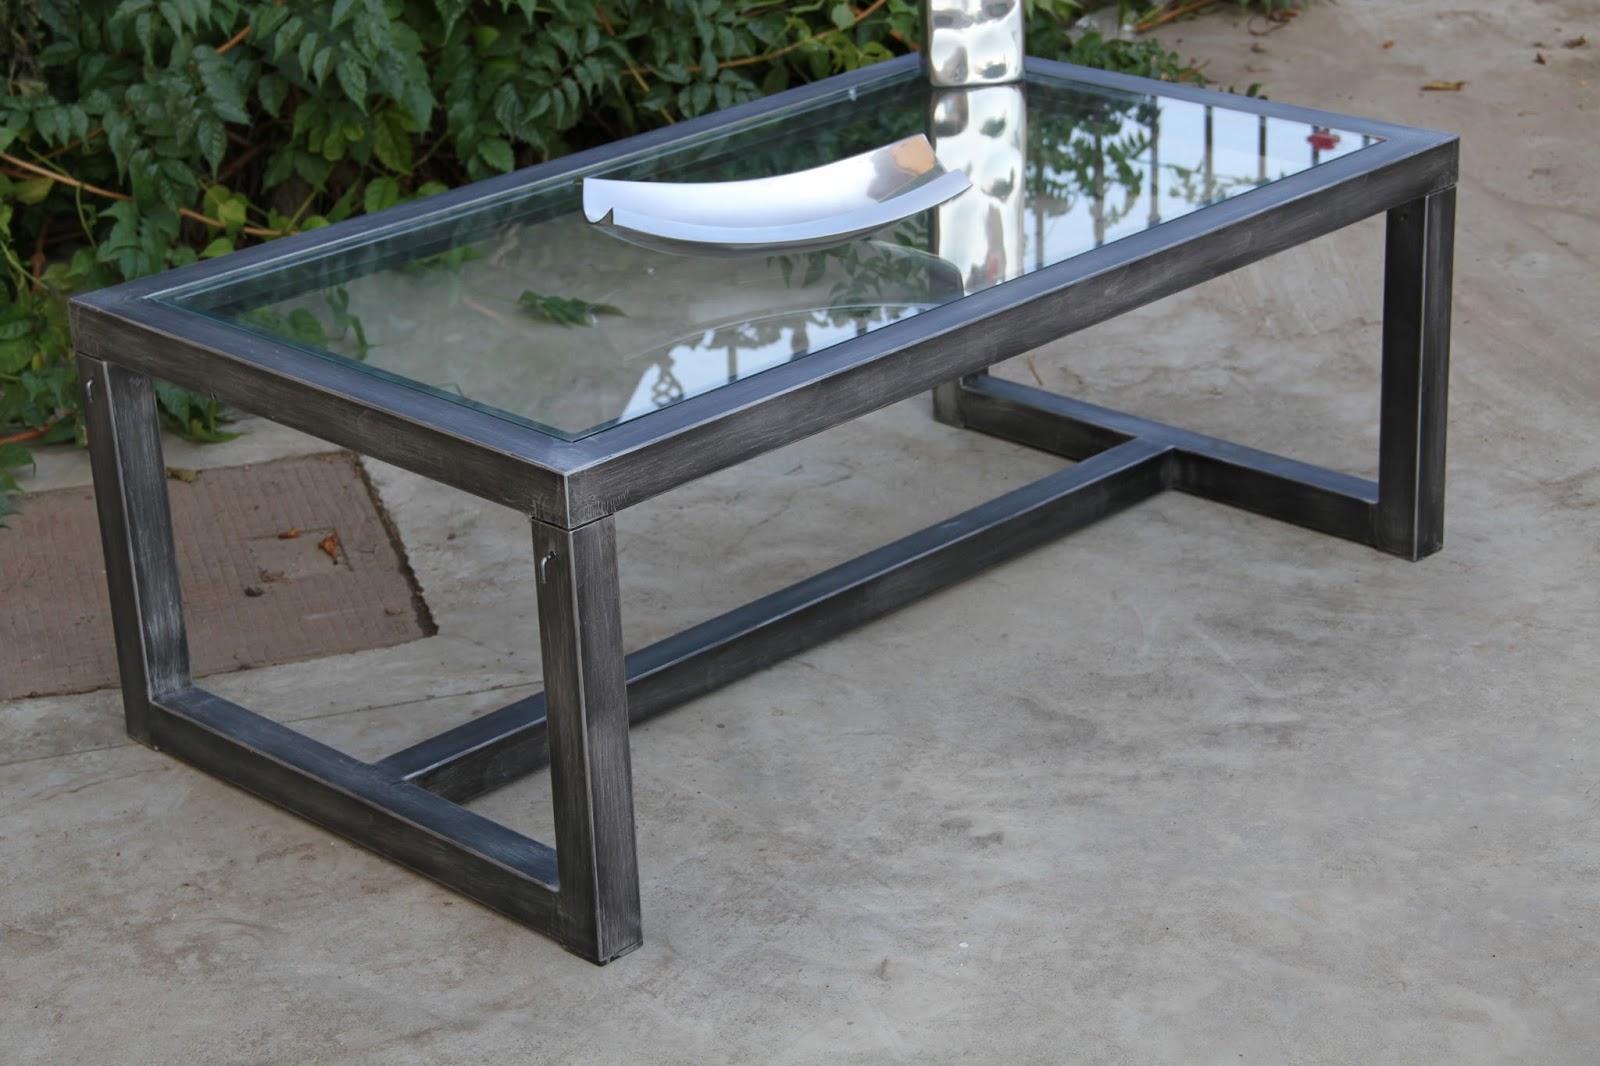 Casa de este alojamiento mesas y sillas forja hierro - Mesa de forja ...